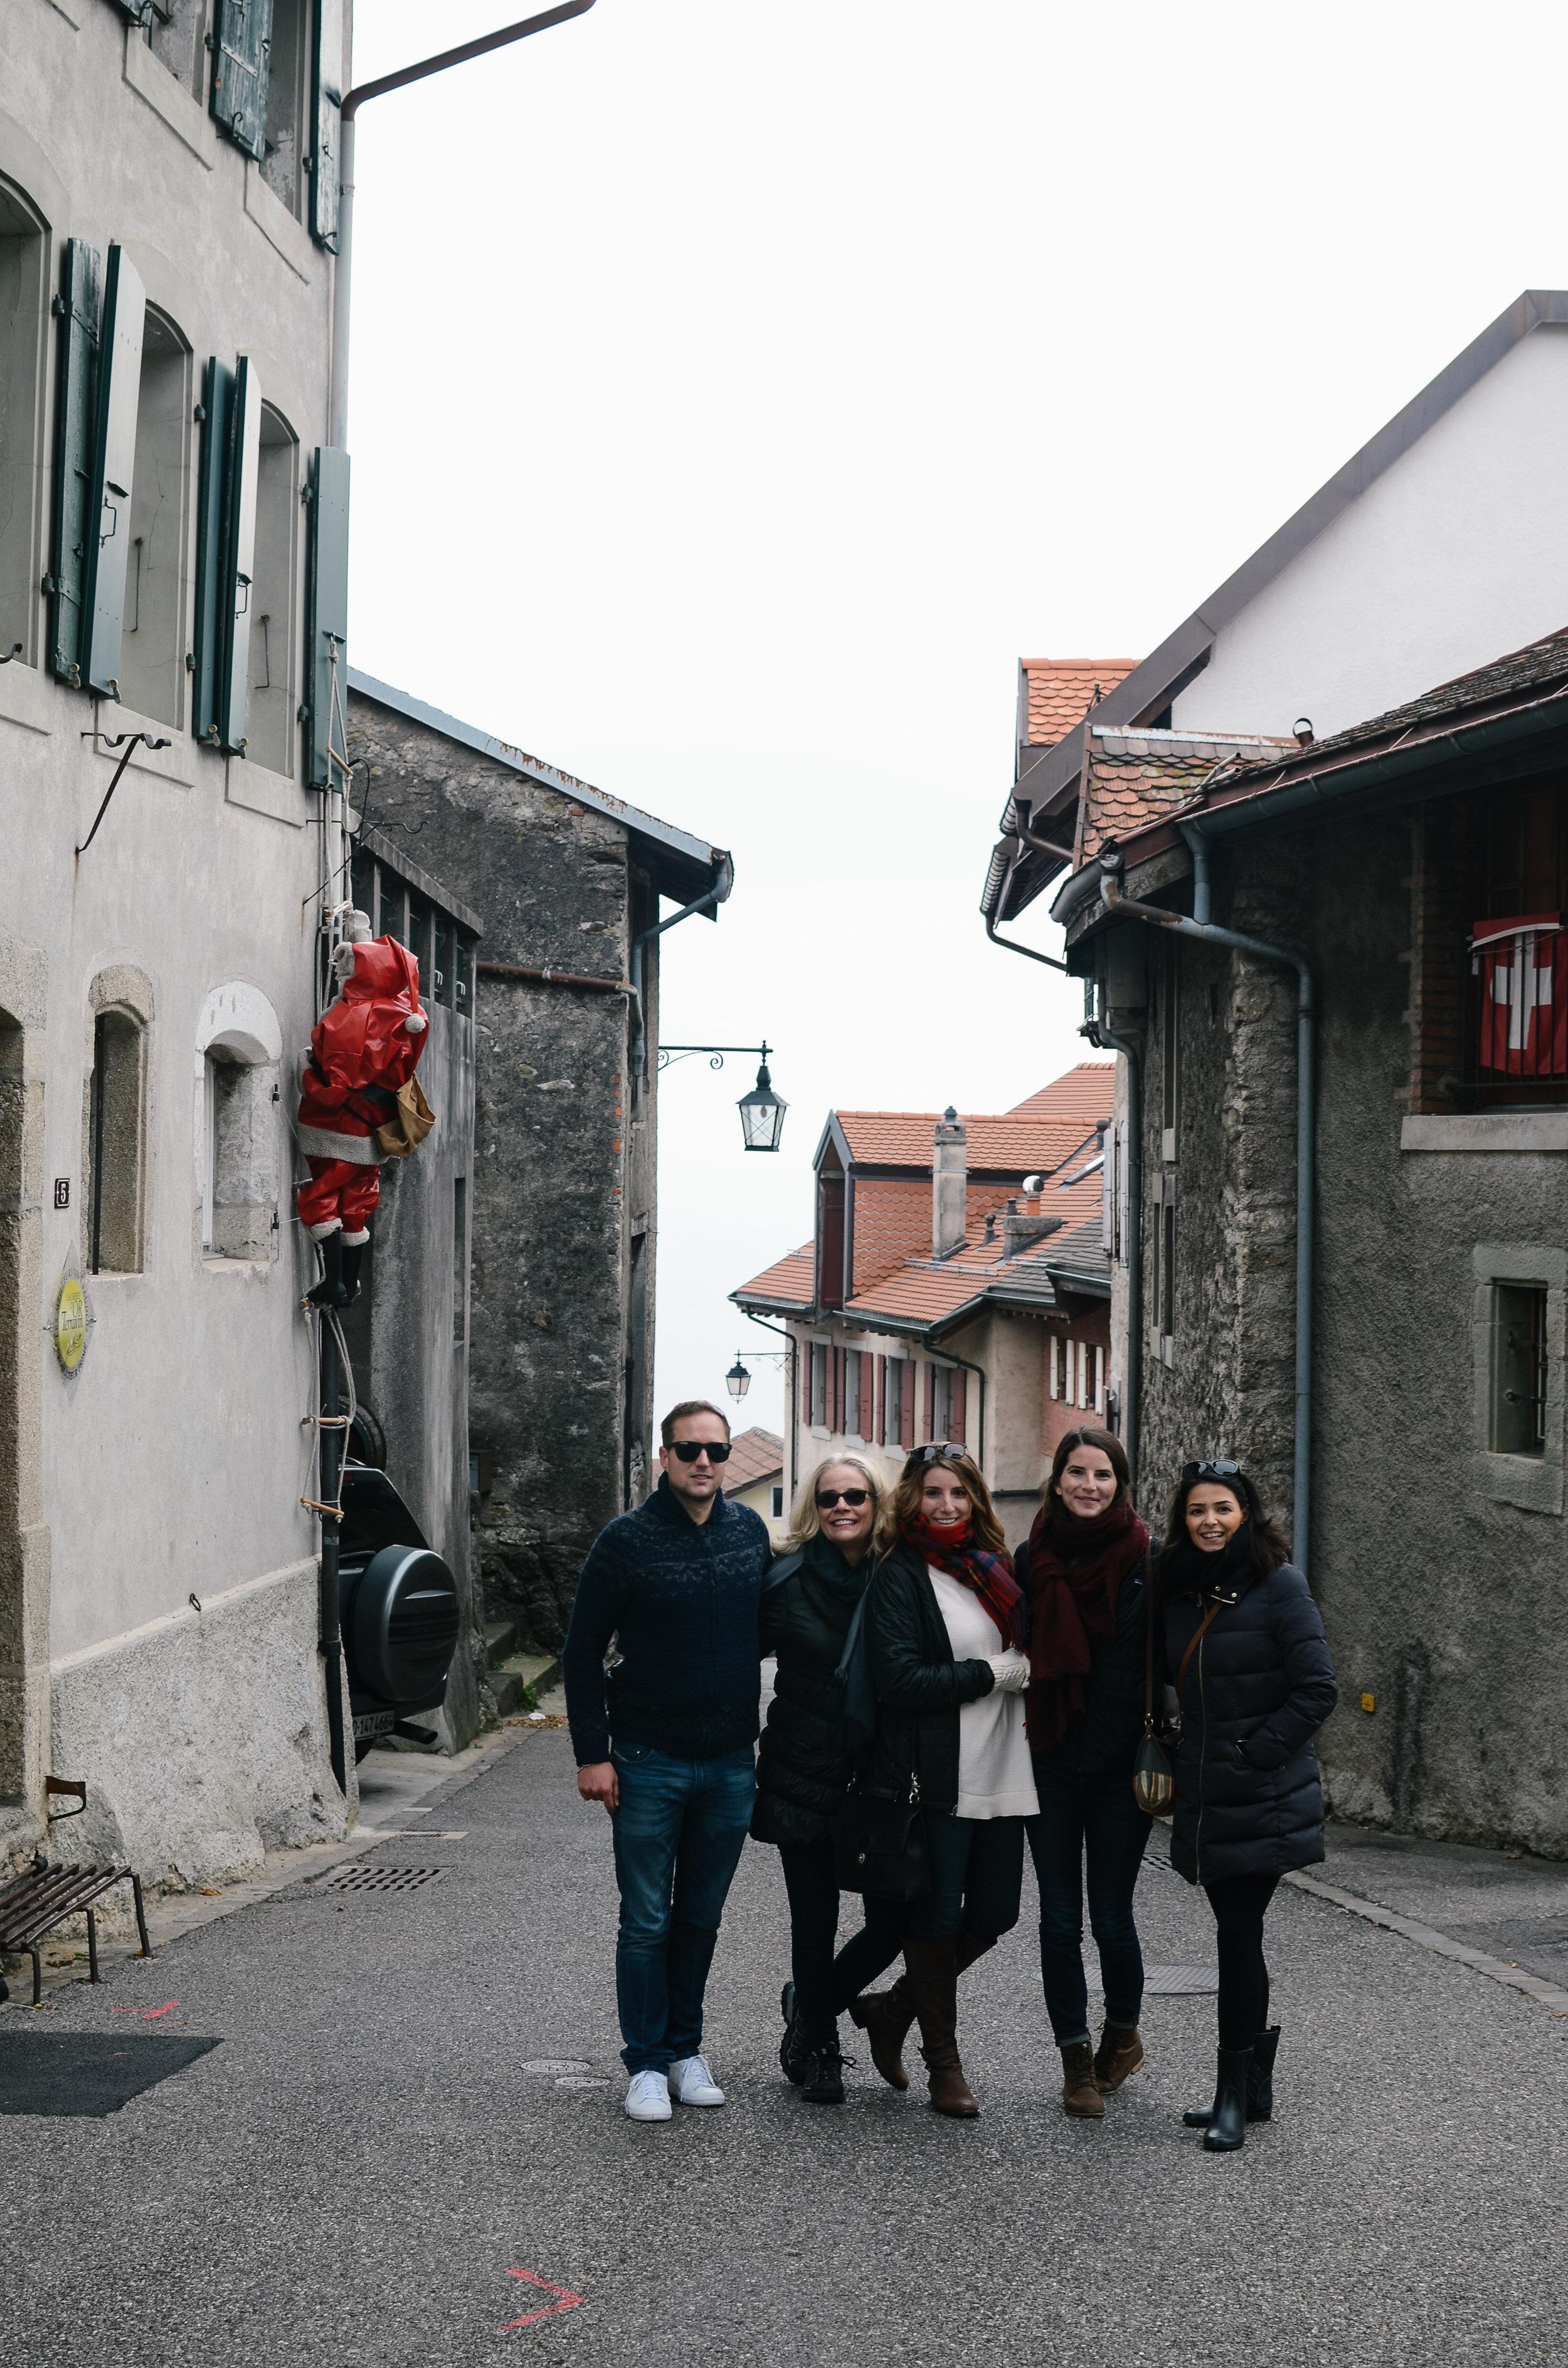 Day-Trips-From-Geneva-Switzerland_DSC_0800.jpg